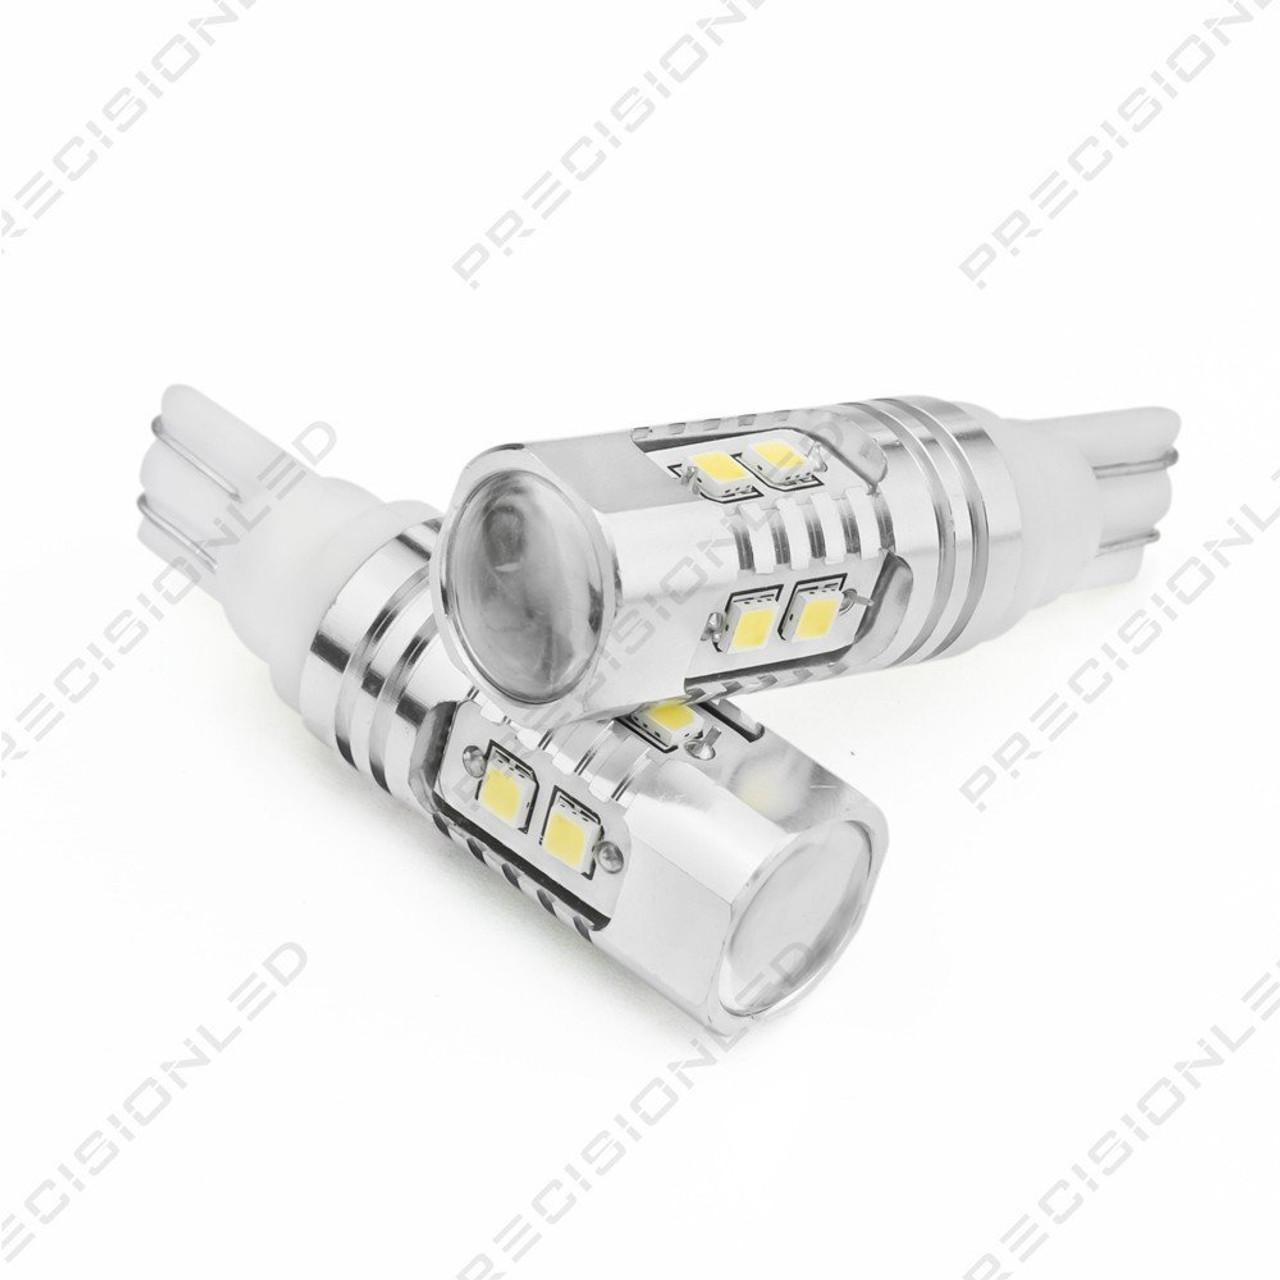 Honda Civic Hatch LED Backup Reverse Lights (2012-2015)